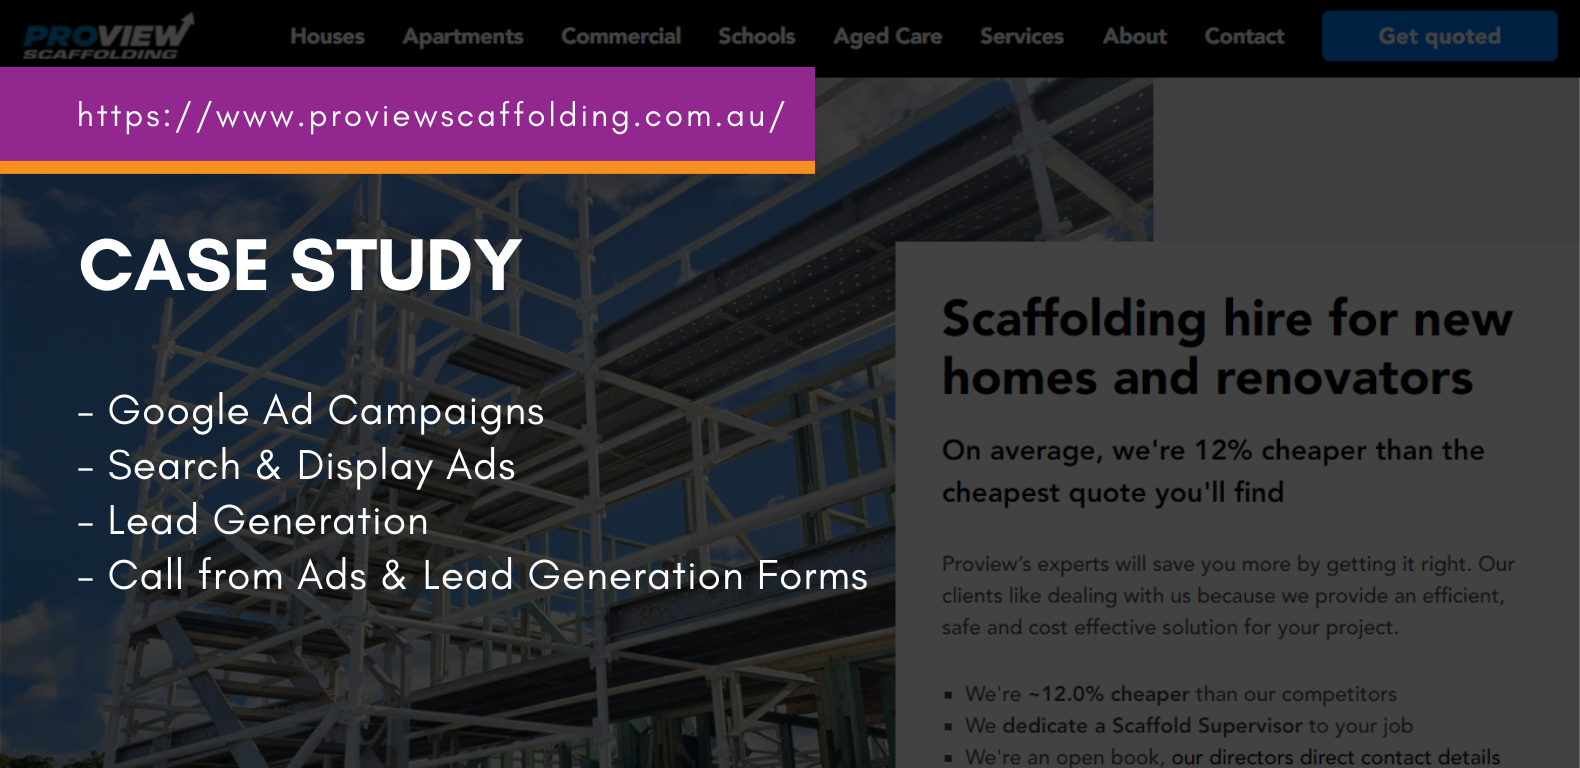 SEM-PPC-Proview-Scaffolding-Australia-Case-Study